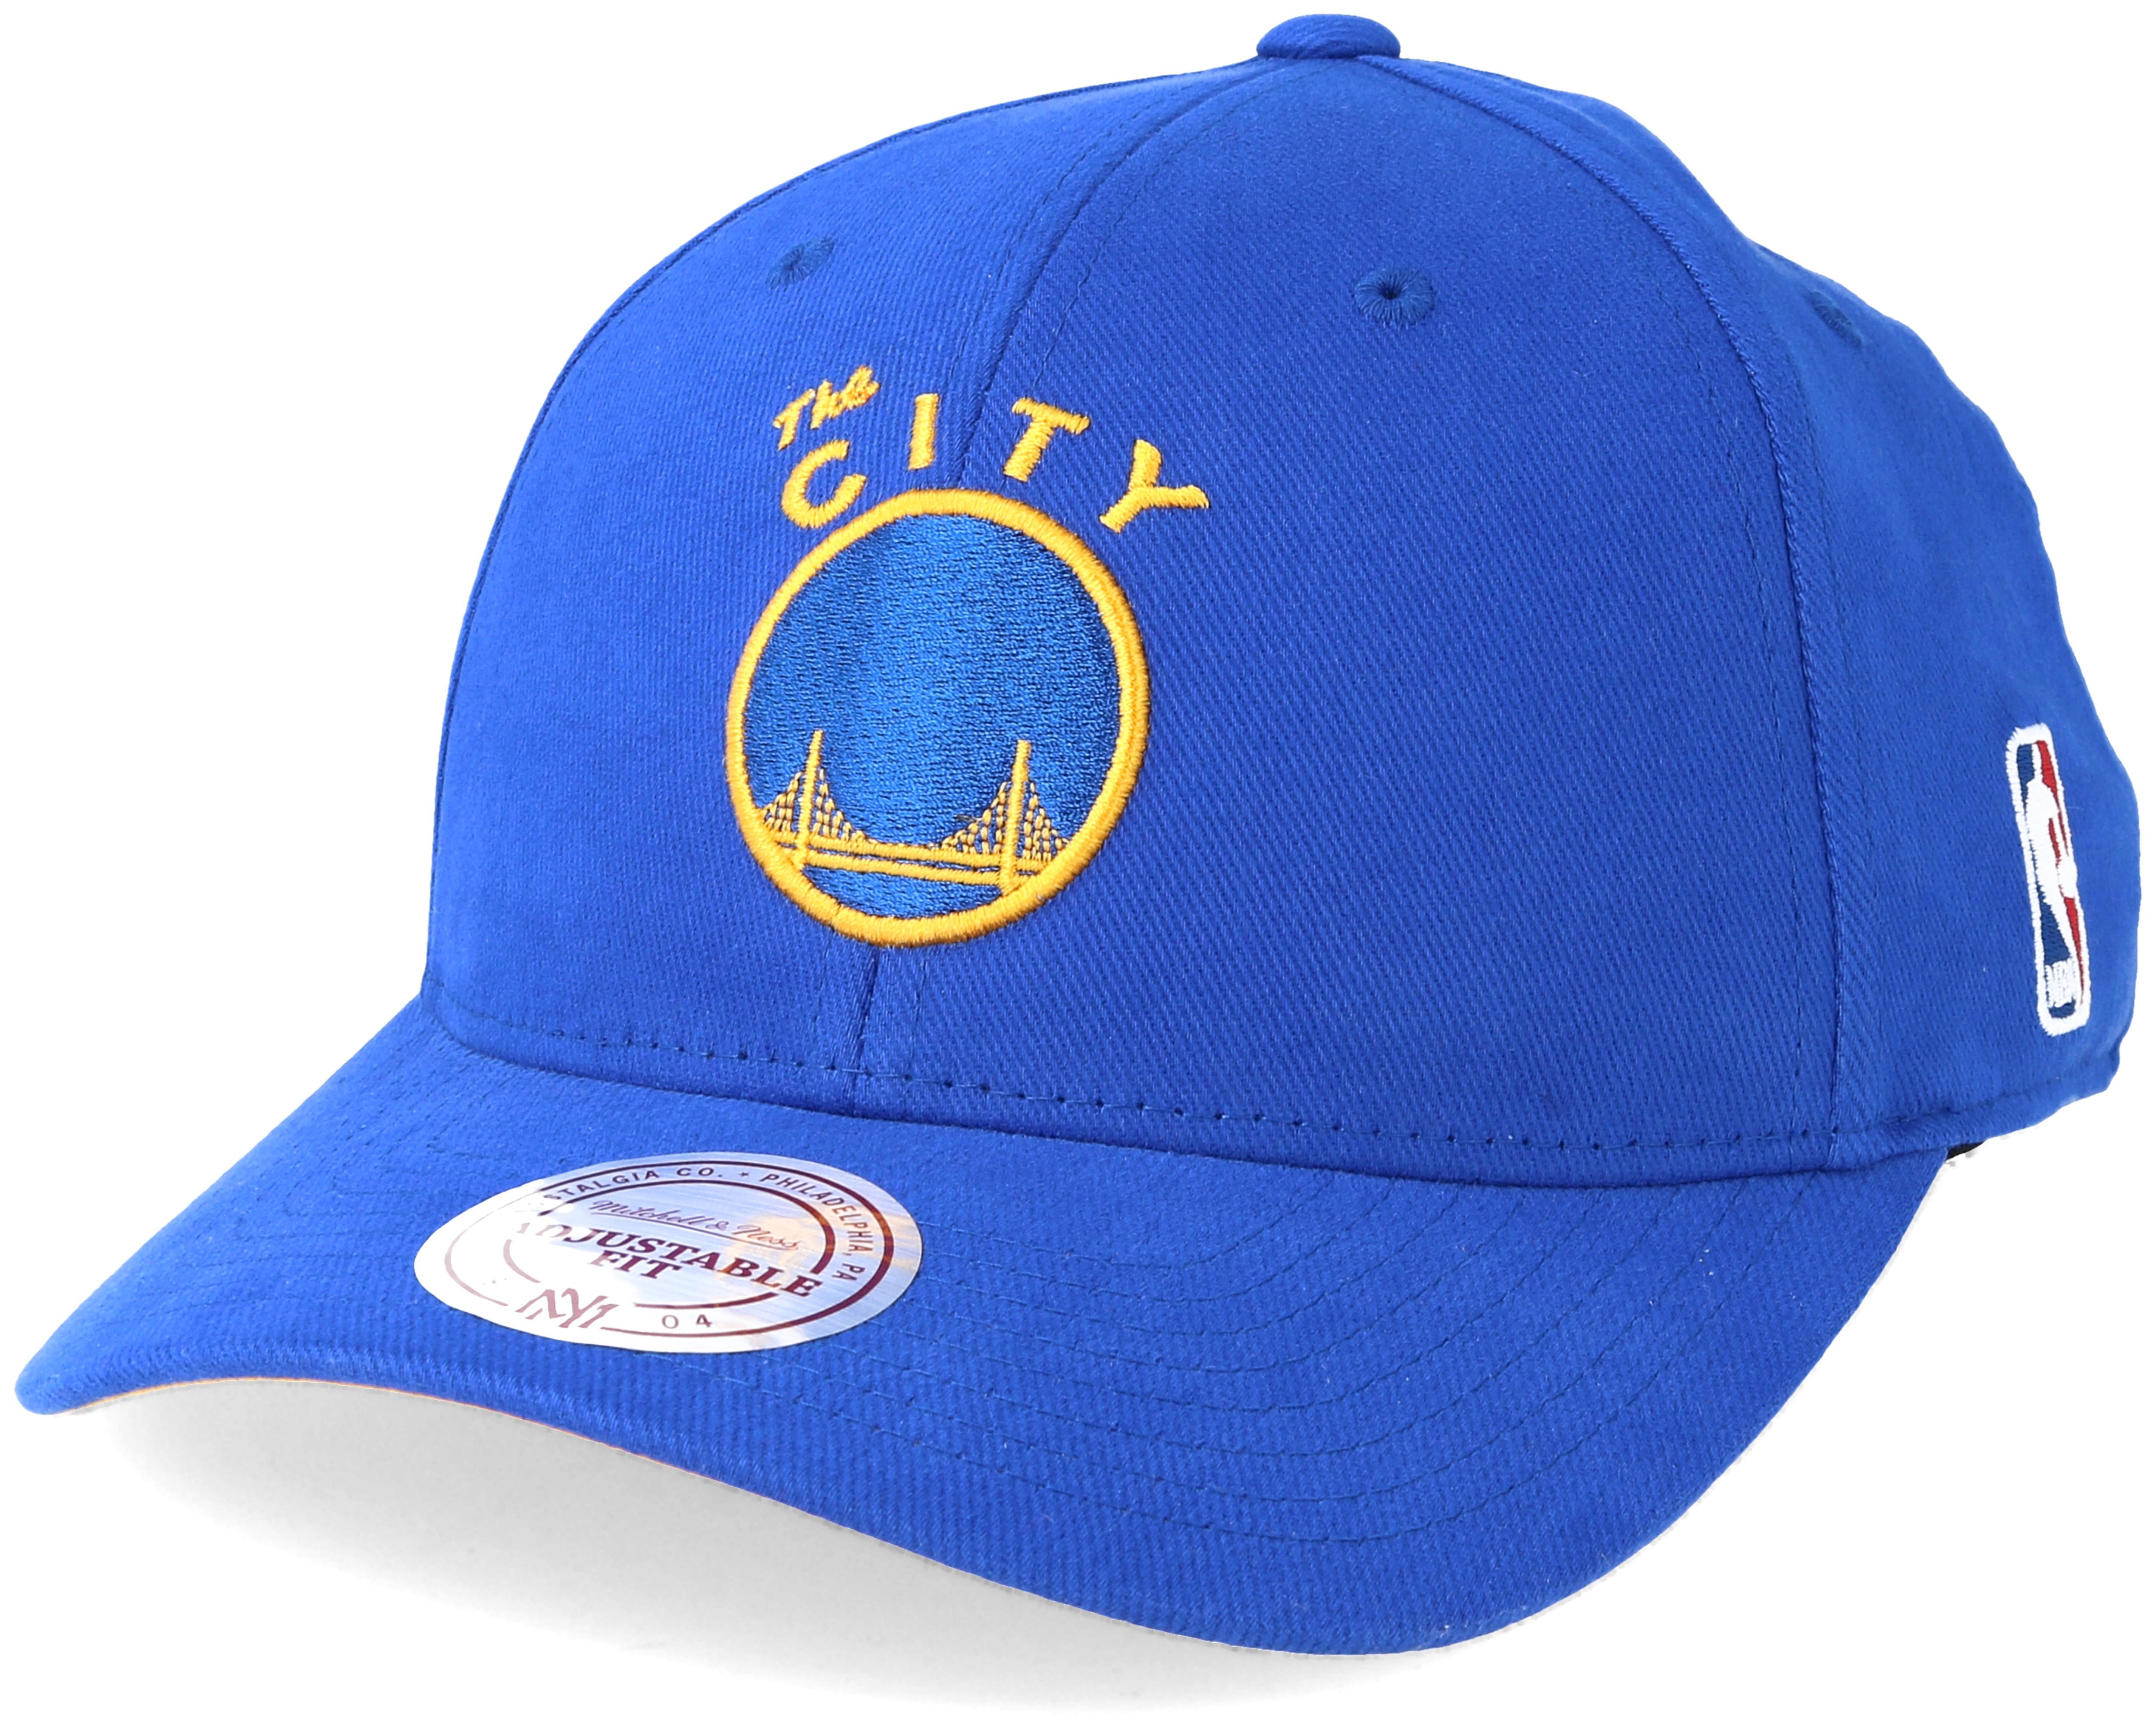 Golden State Warriors Flexfit 110 Low Pro Blue Adjustable - Mitchell ... fa0486584186